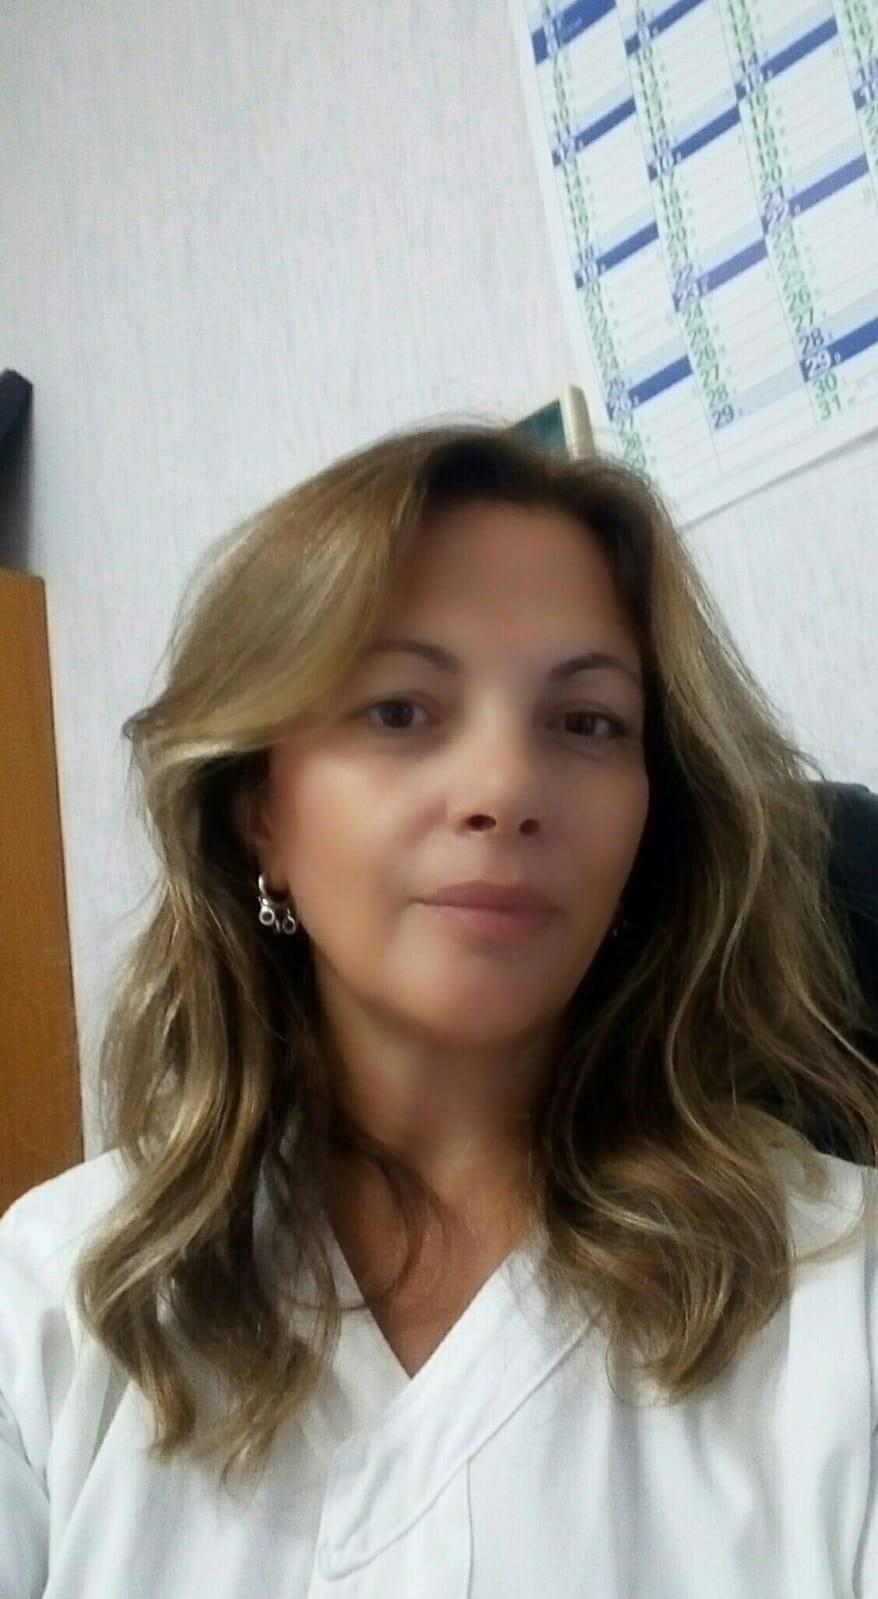 Dr. Nicoletta Urbano